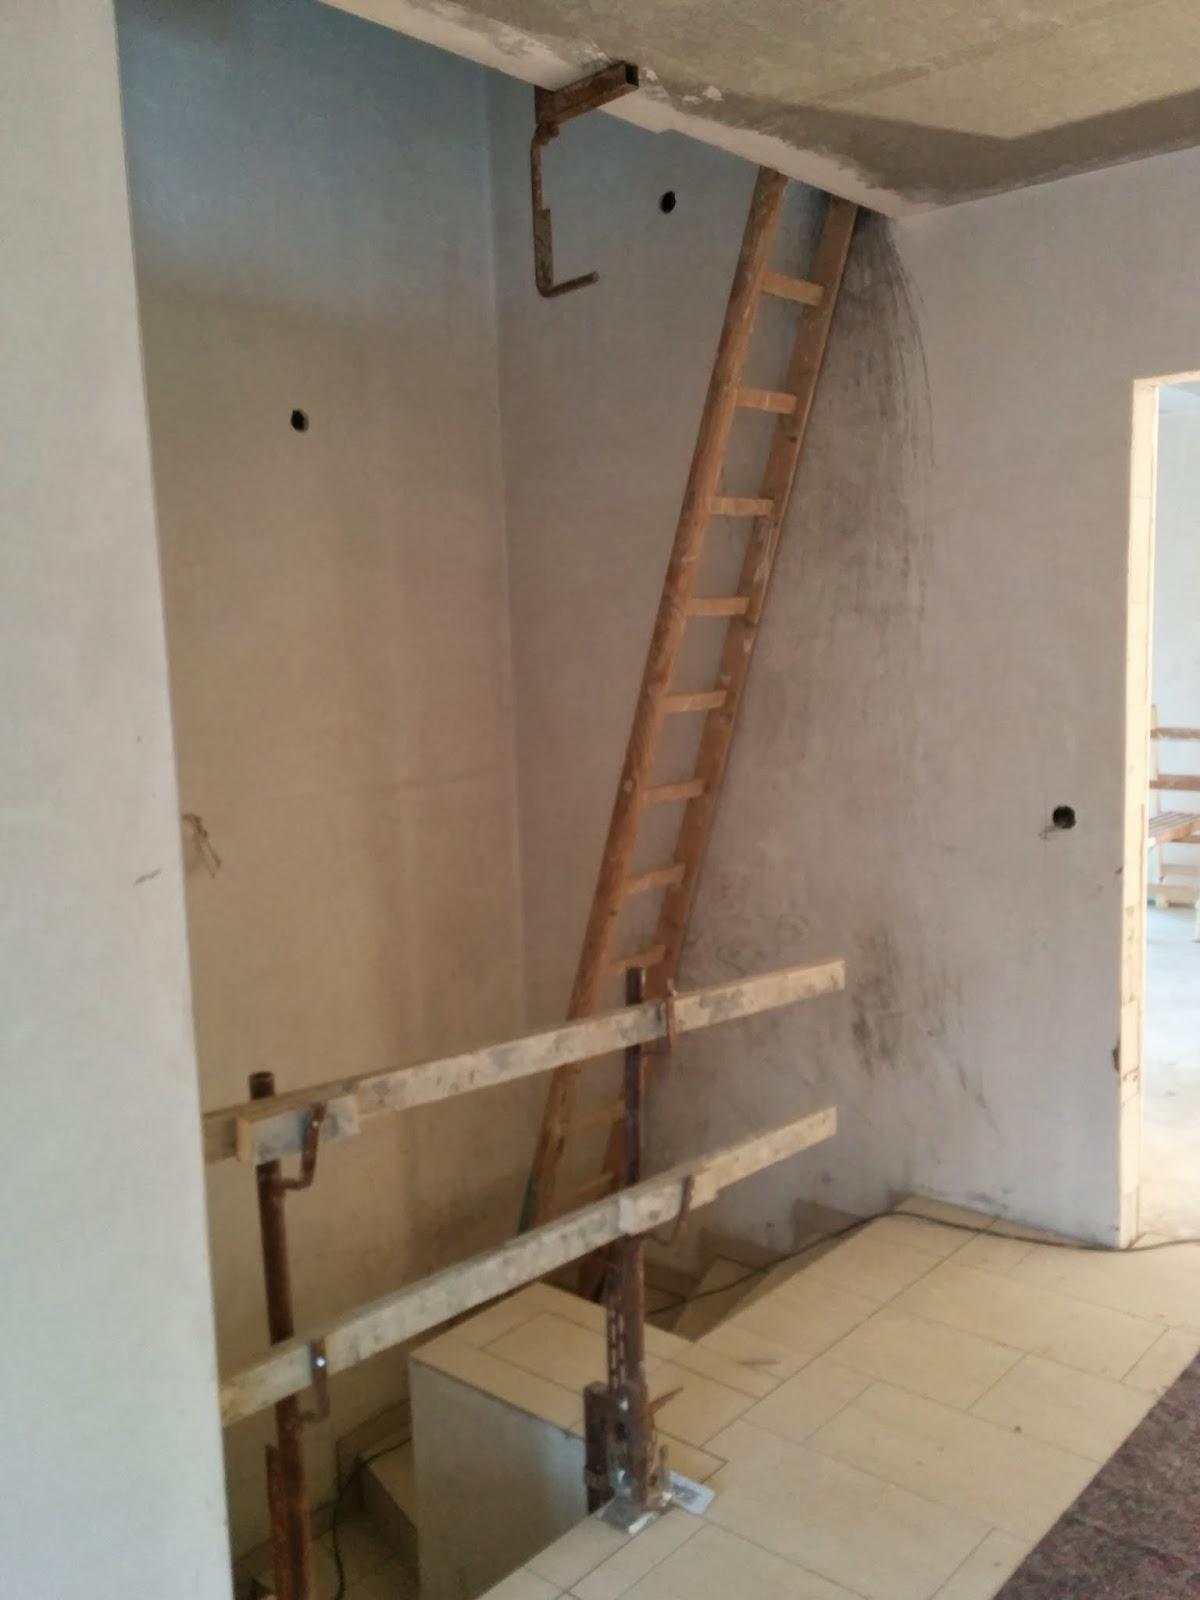 Turbo Unser Hausbau in Hamburg: Bye Bye Leiter - die Treppe kommt FA56